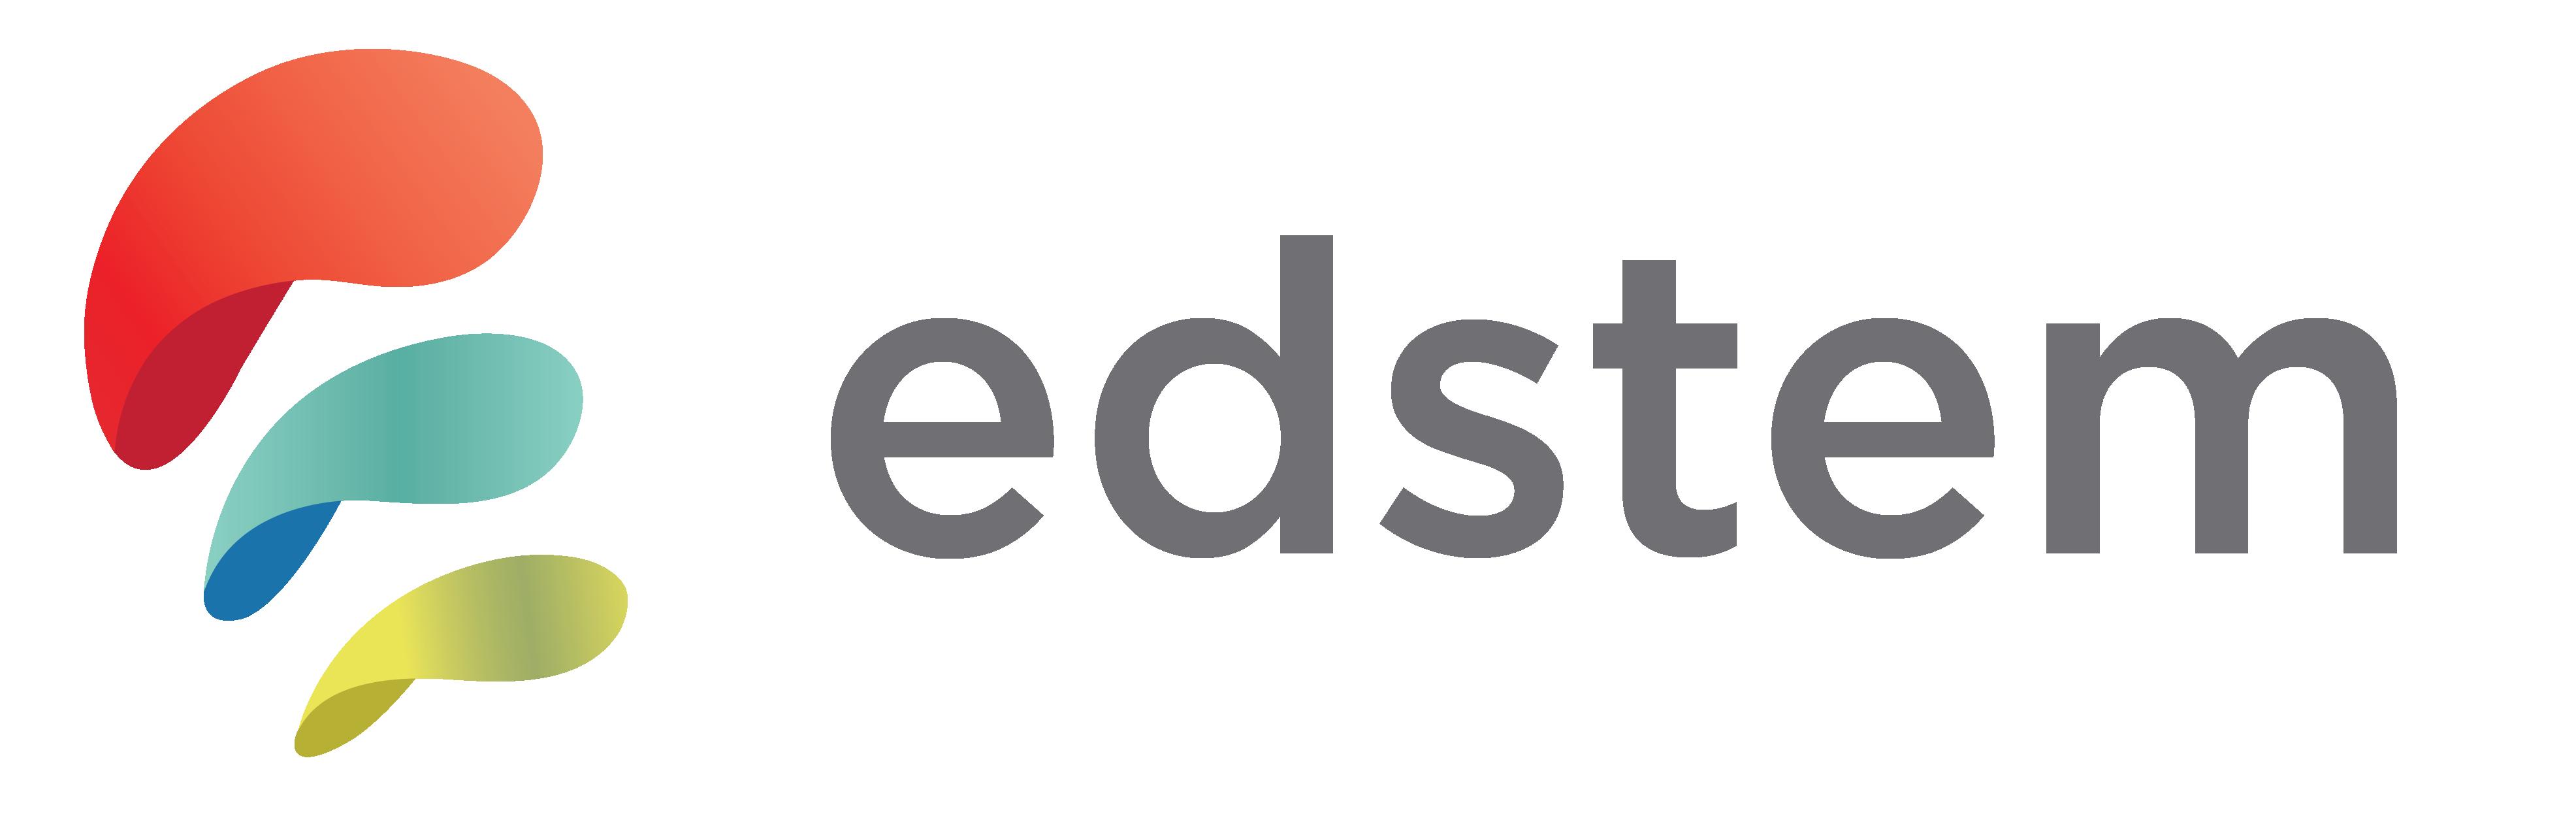 Edstem Technologies - Management company logo